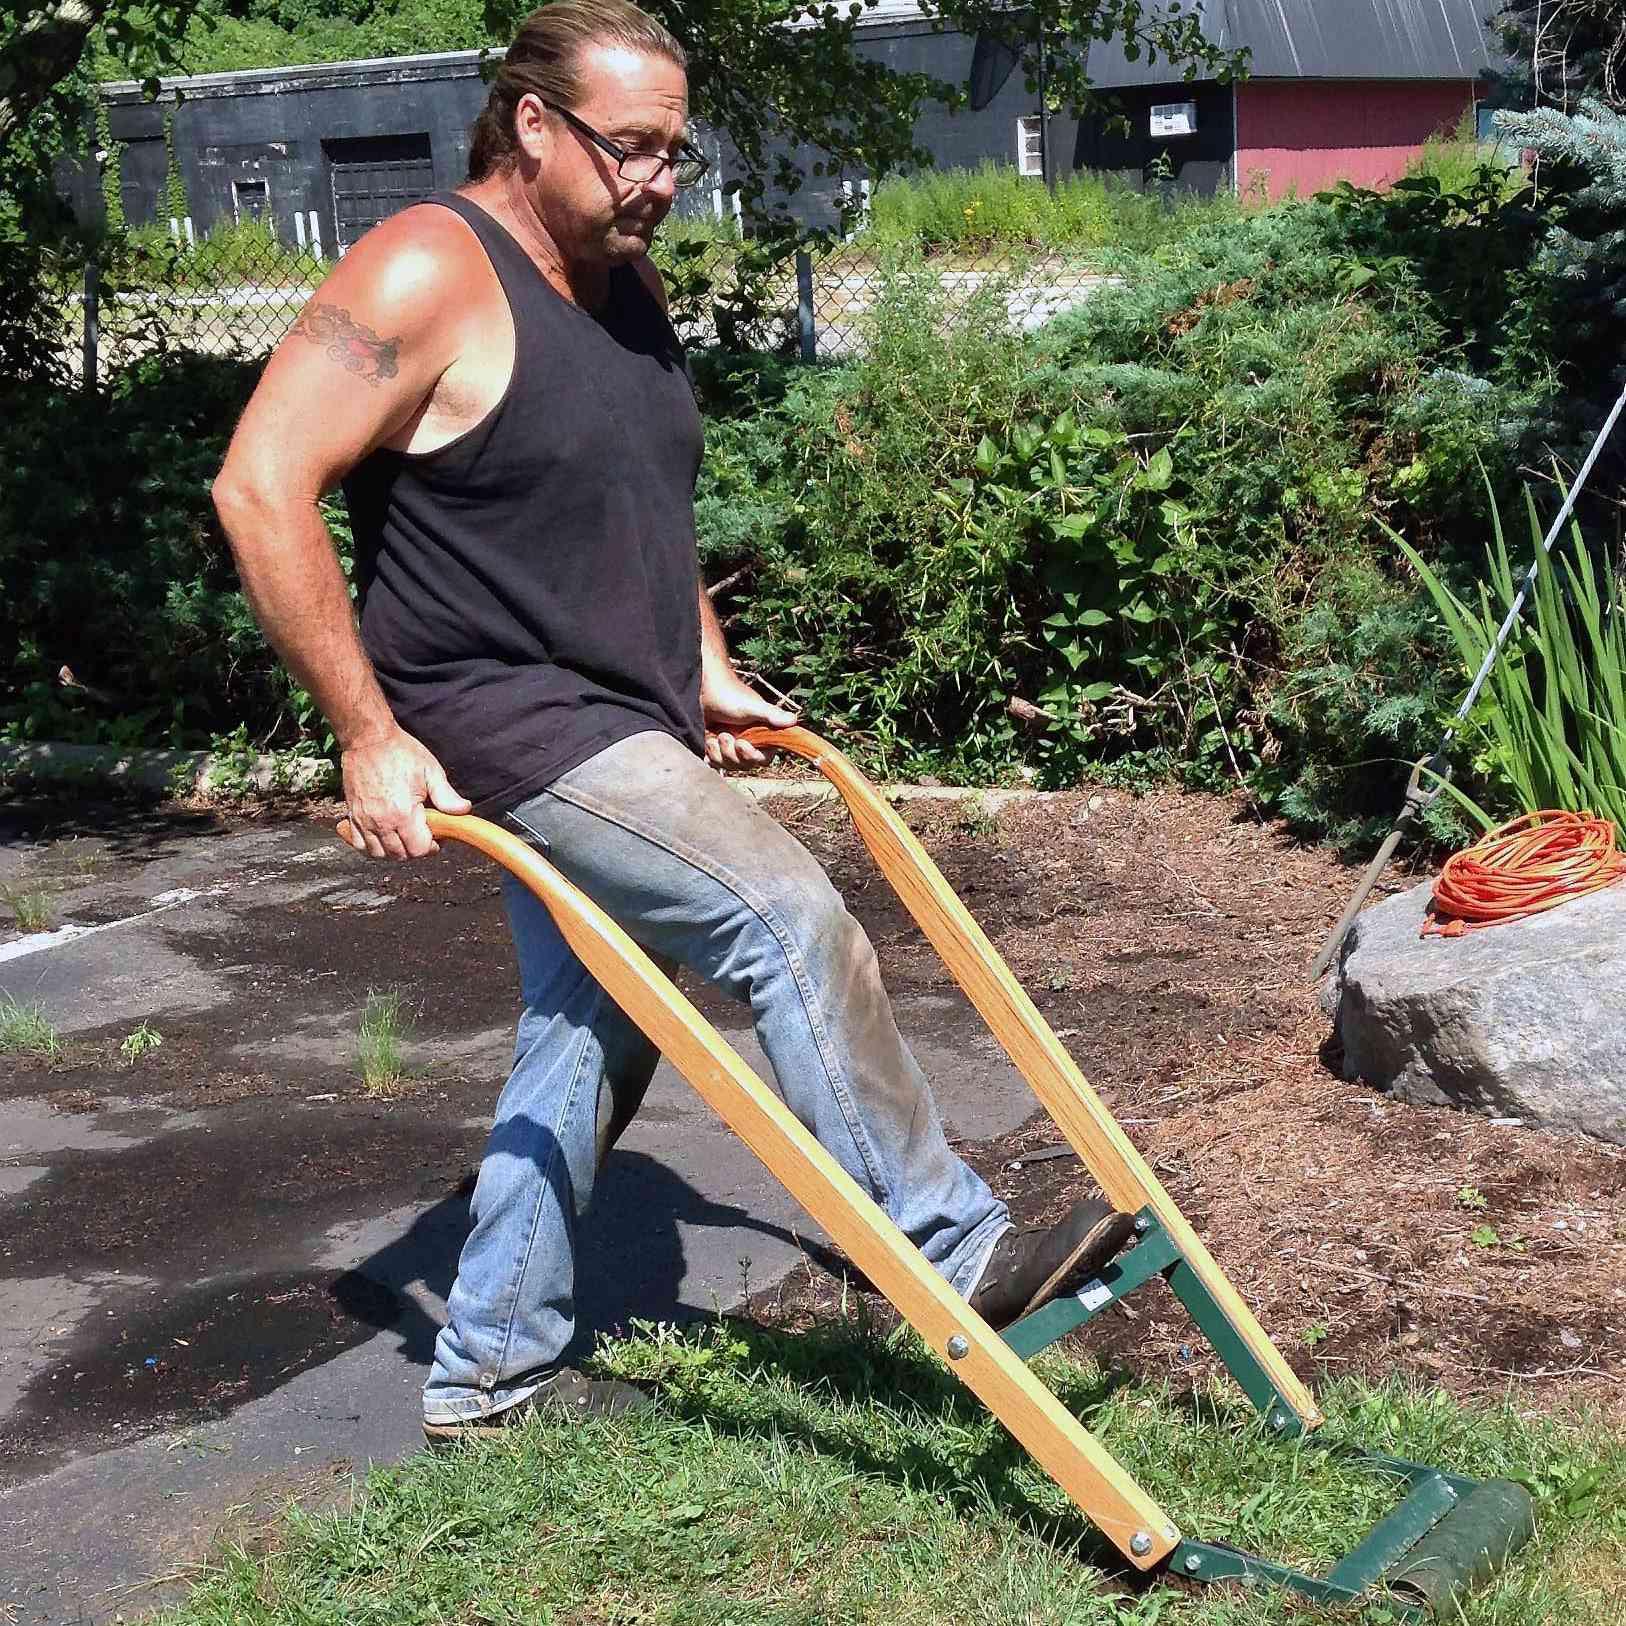 Man pushing manual sod cutter